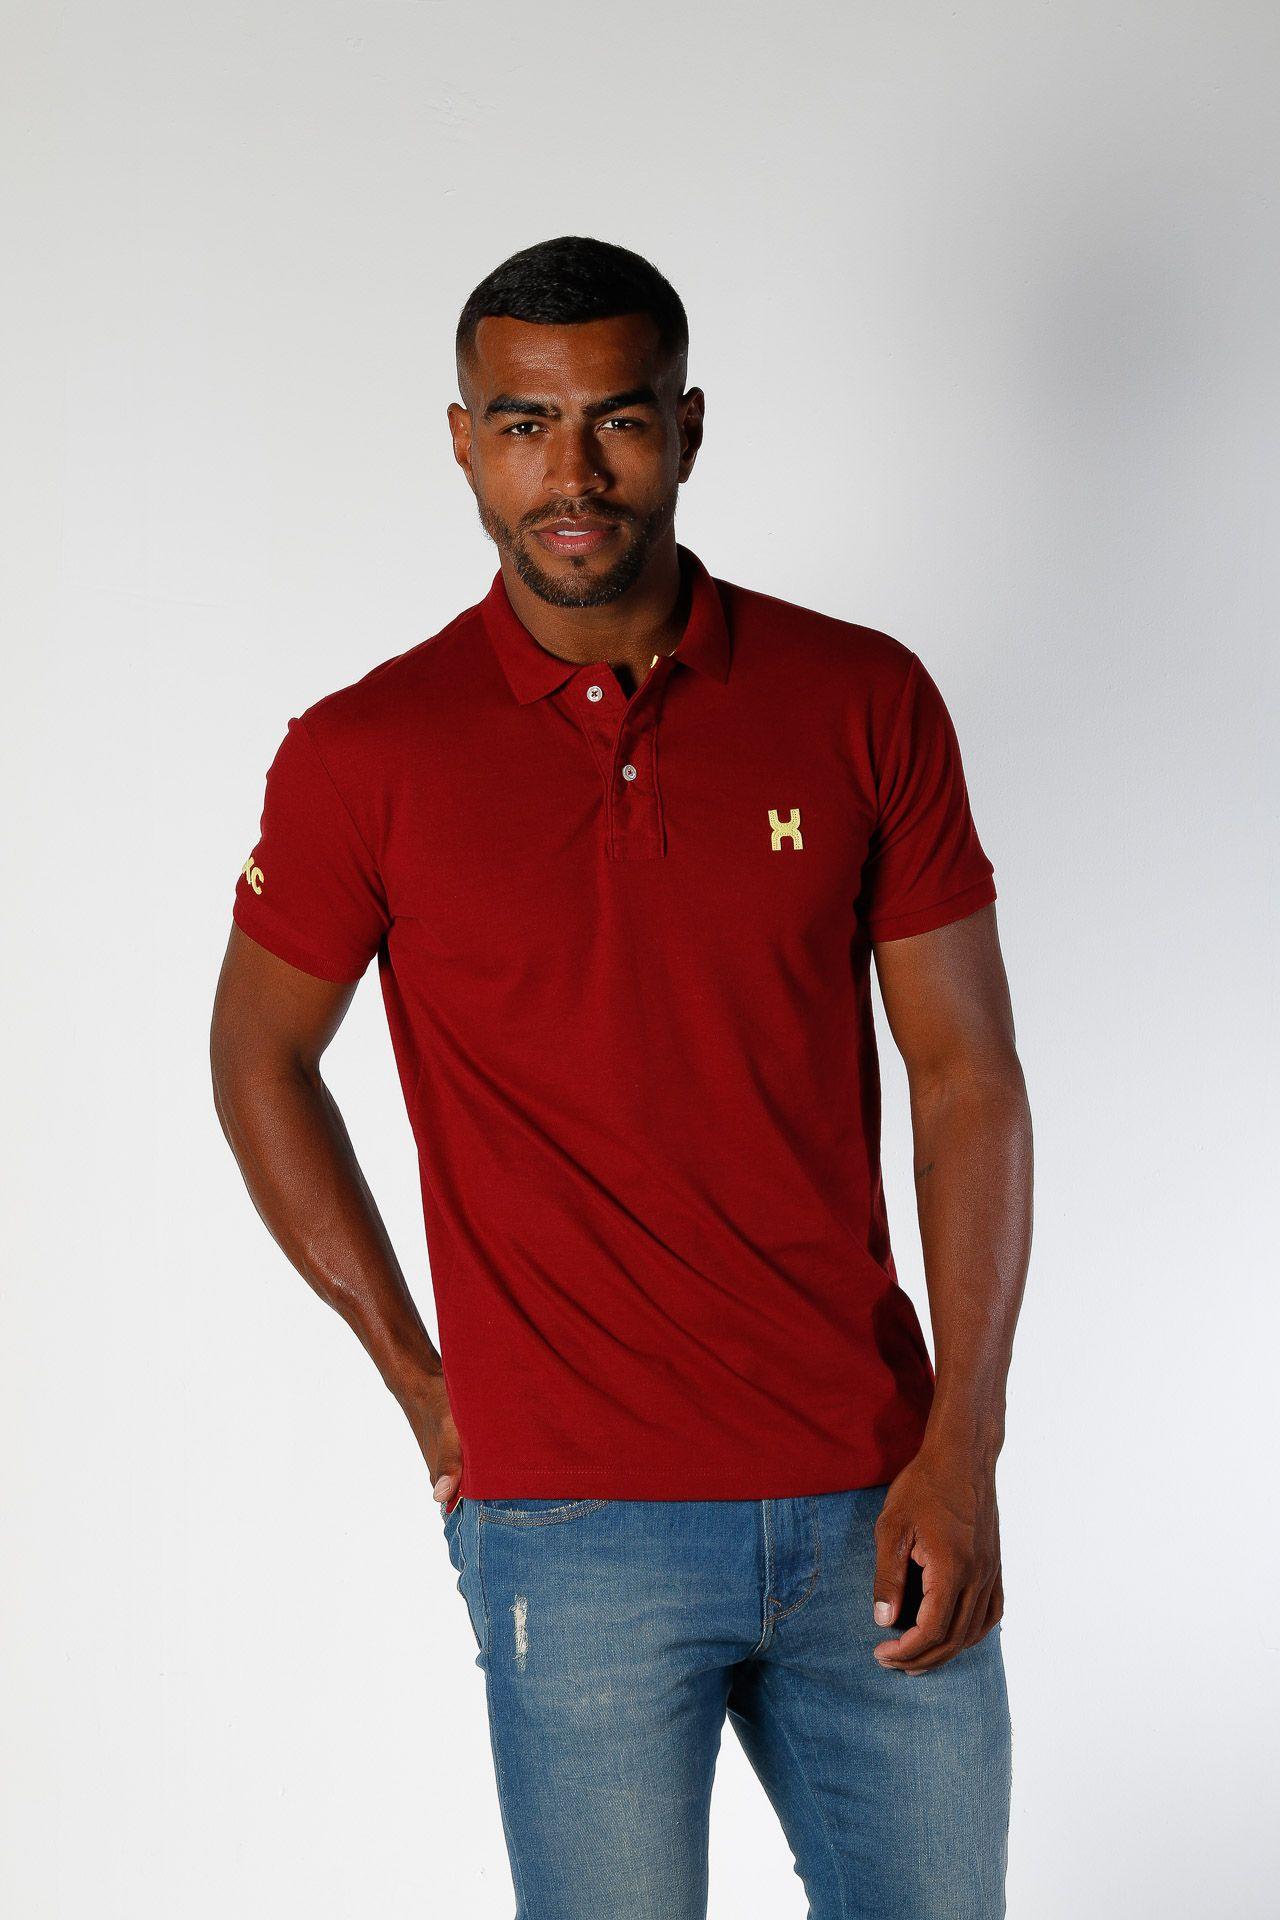 Camiseta Masculina Txc Gola Polo Algodão Lisa - Vermelho Bordô